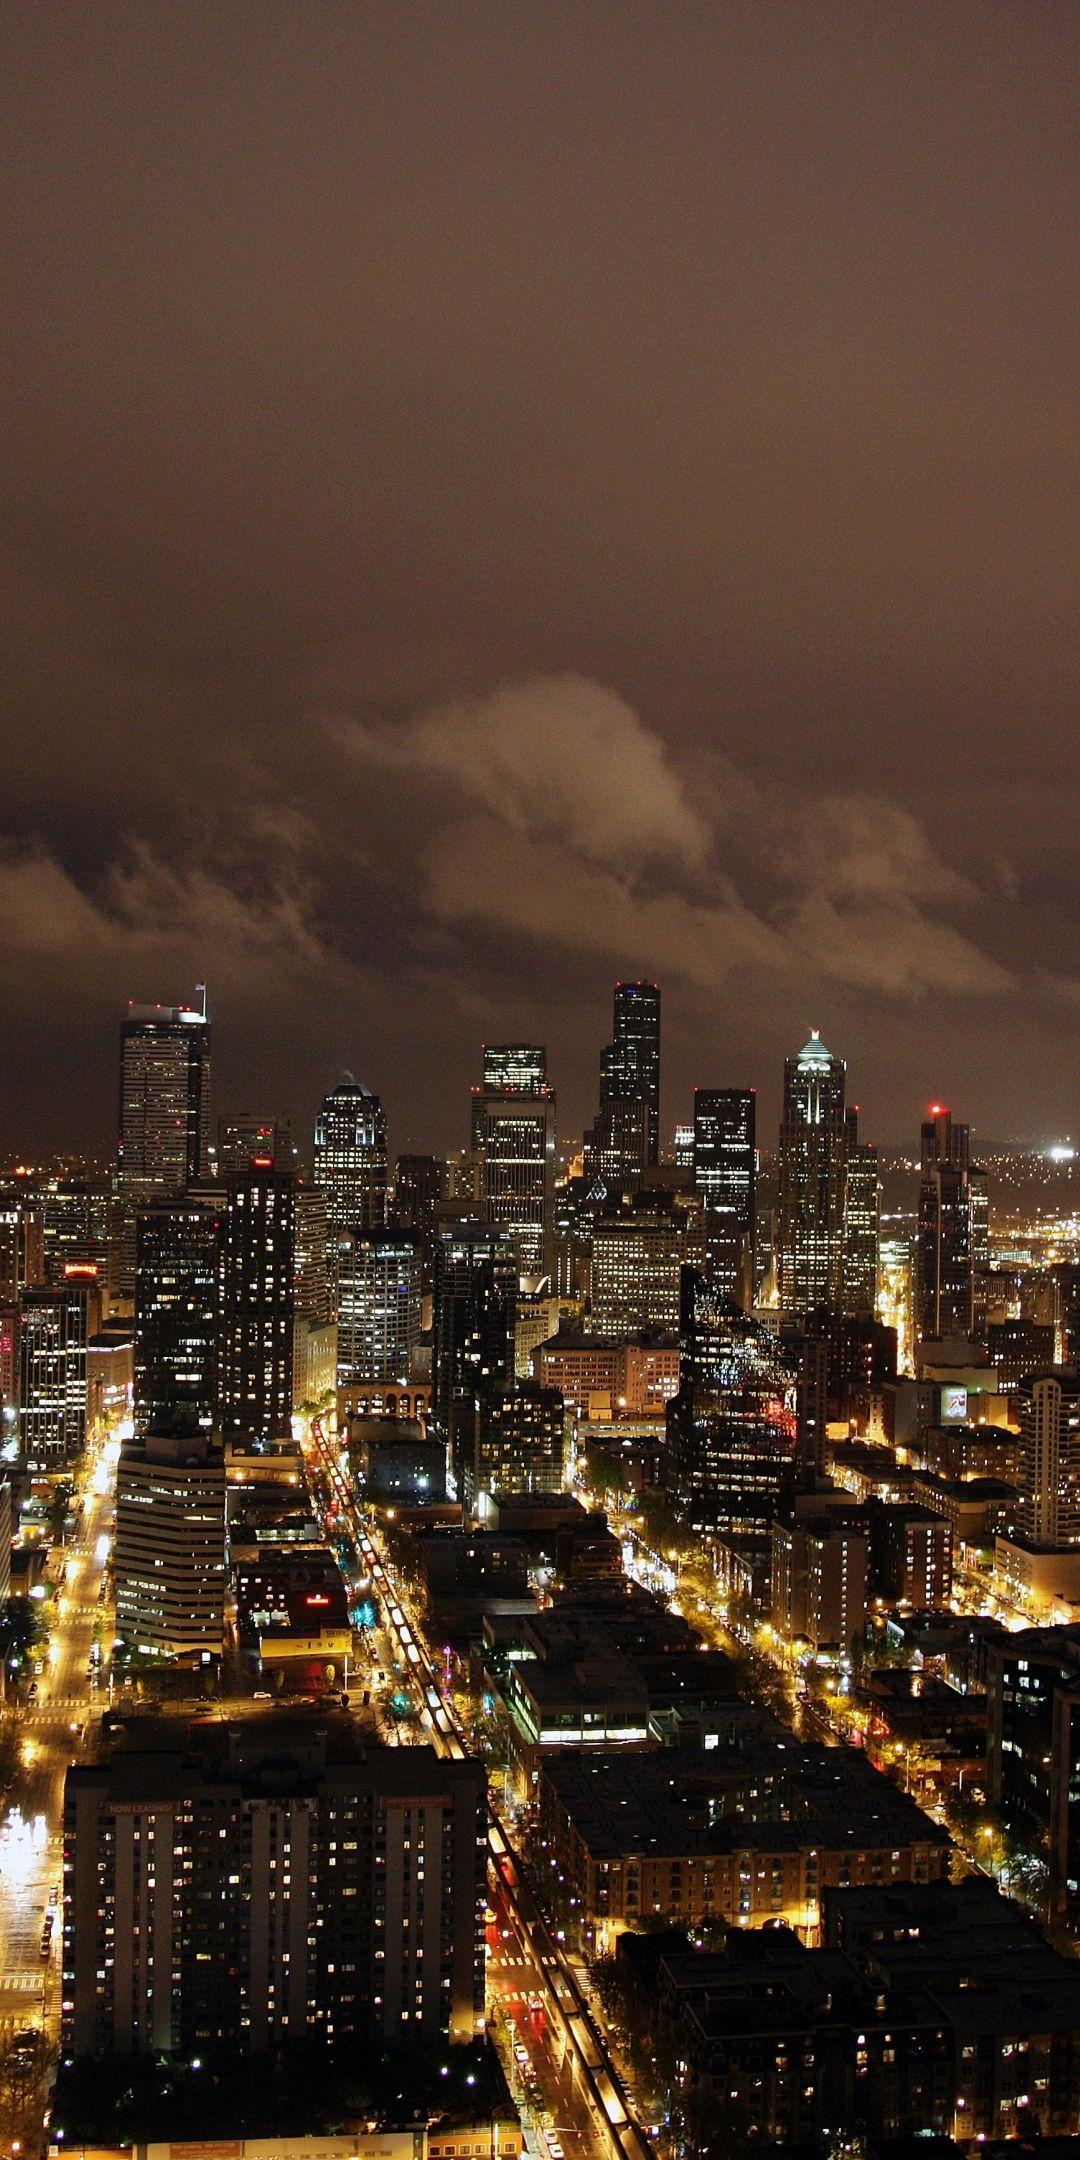 Night, city, buildings, skyscrapers, dark, 1080x21